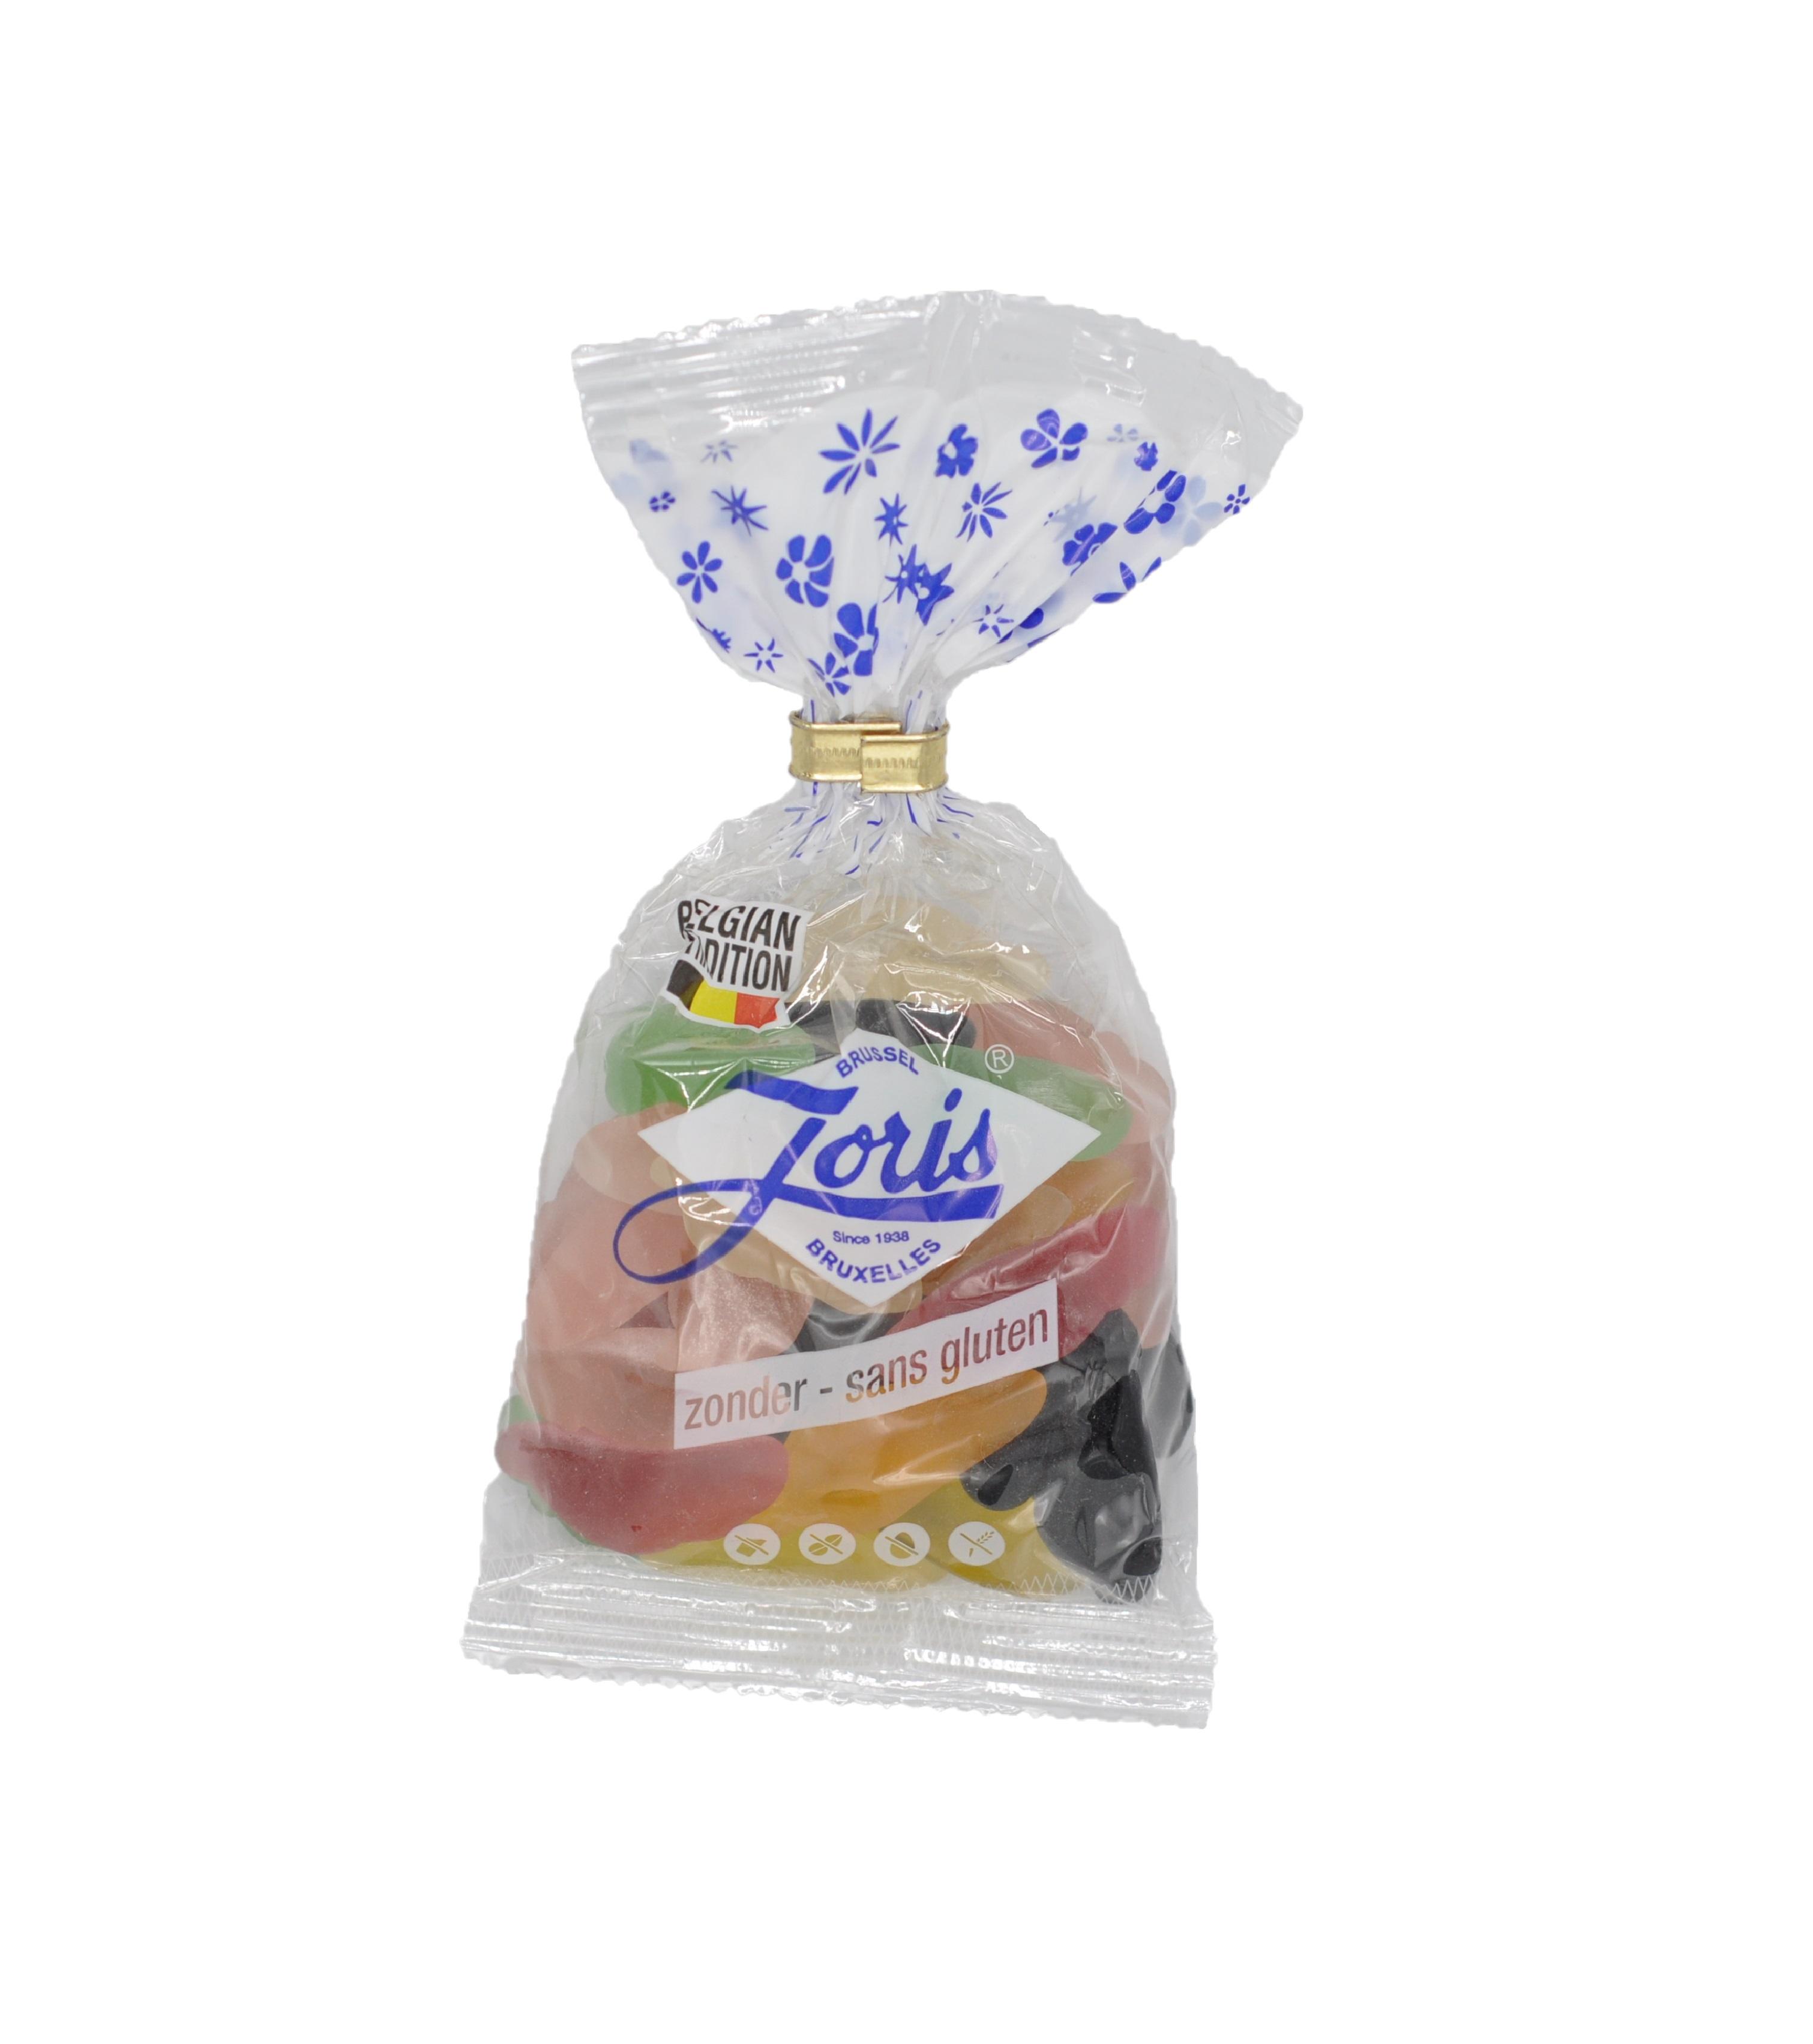 Bonbons Souris en sachet, Joris (130 g)